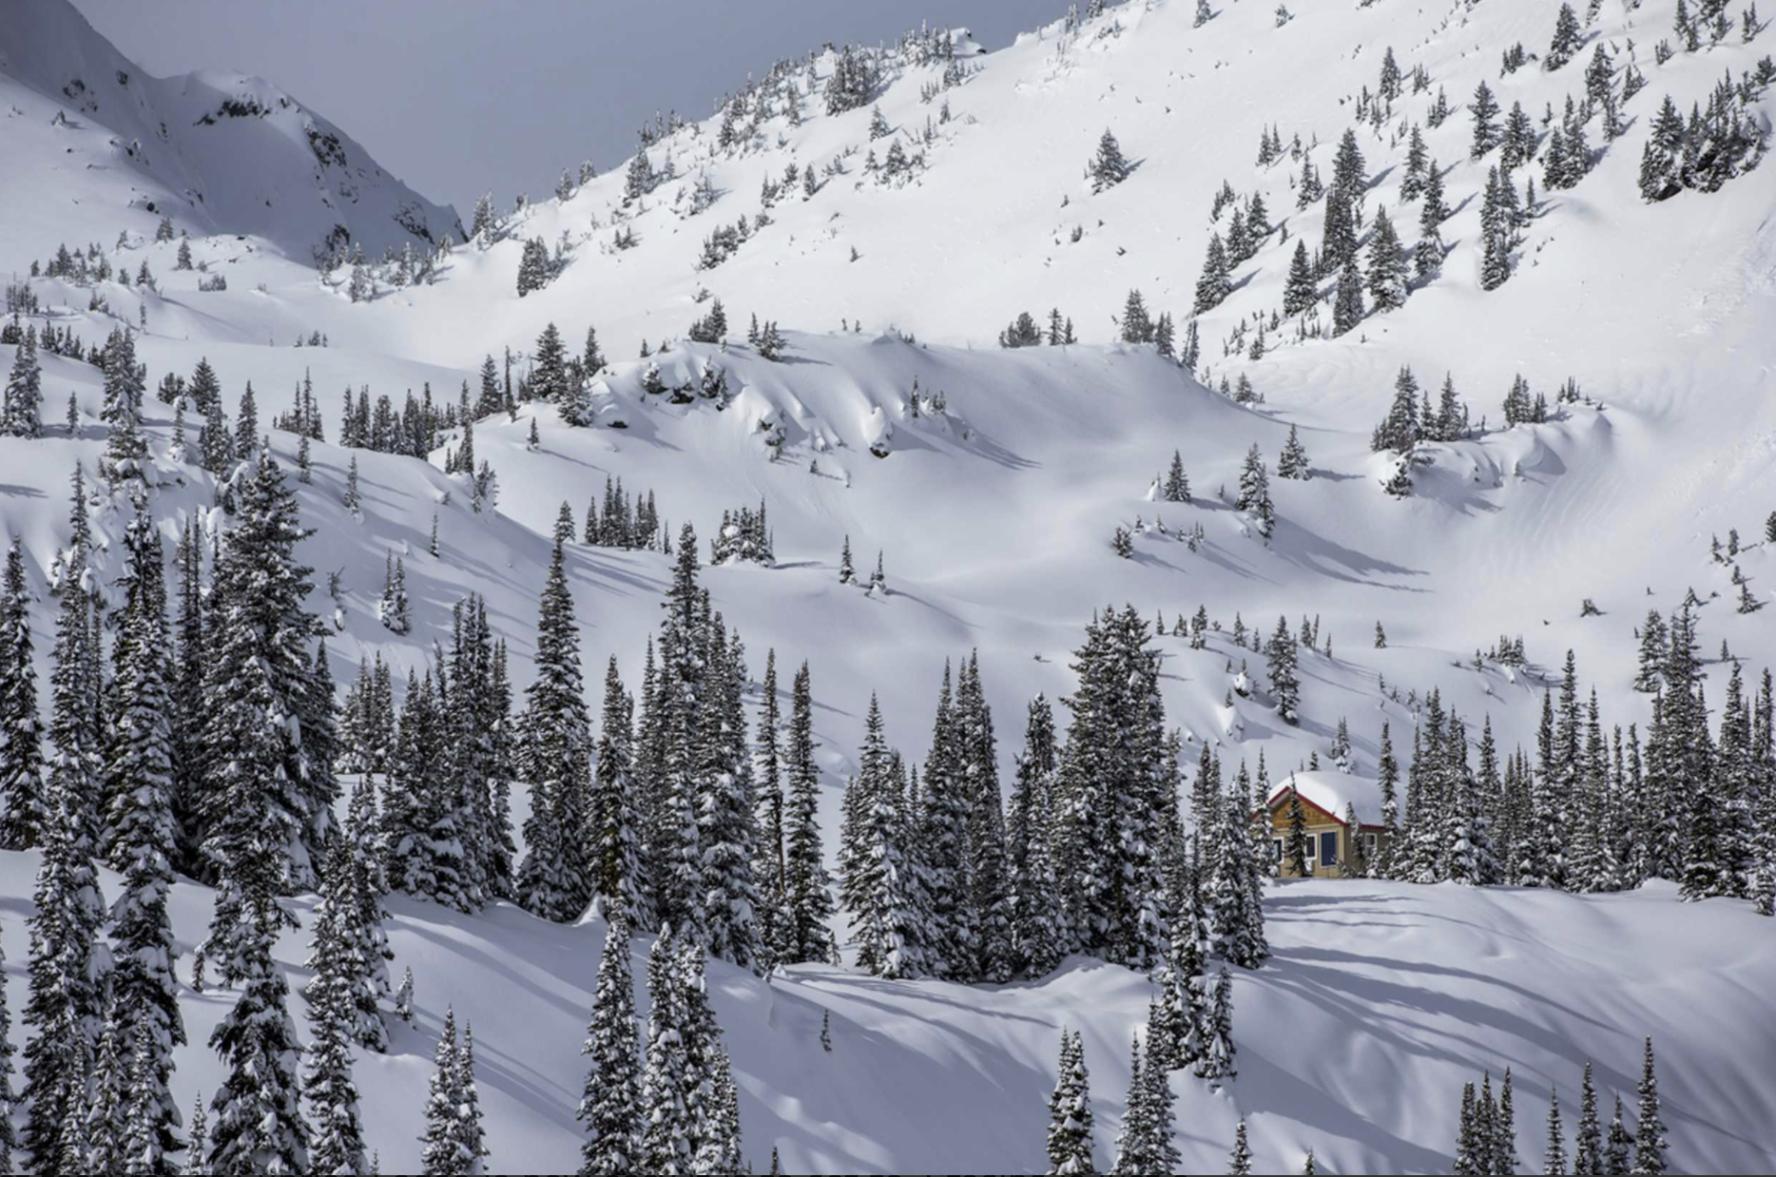 Sunrise Lodge backcountry skiing